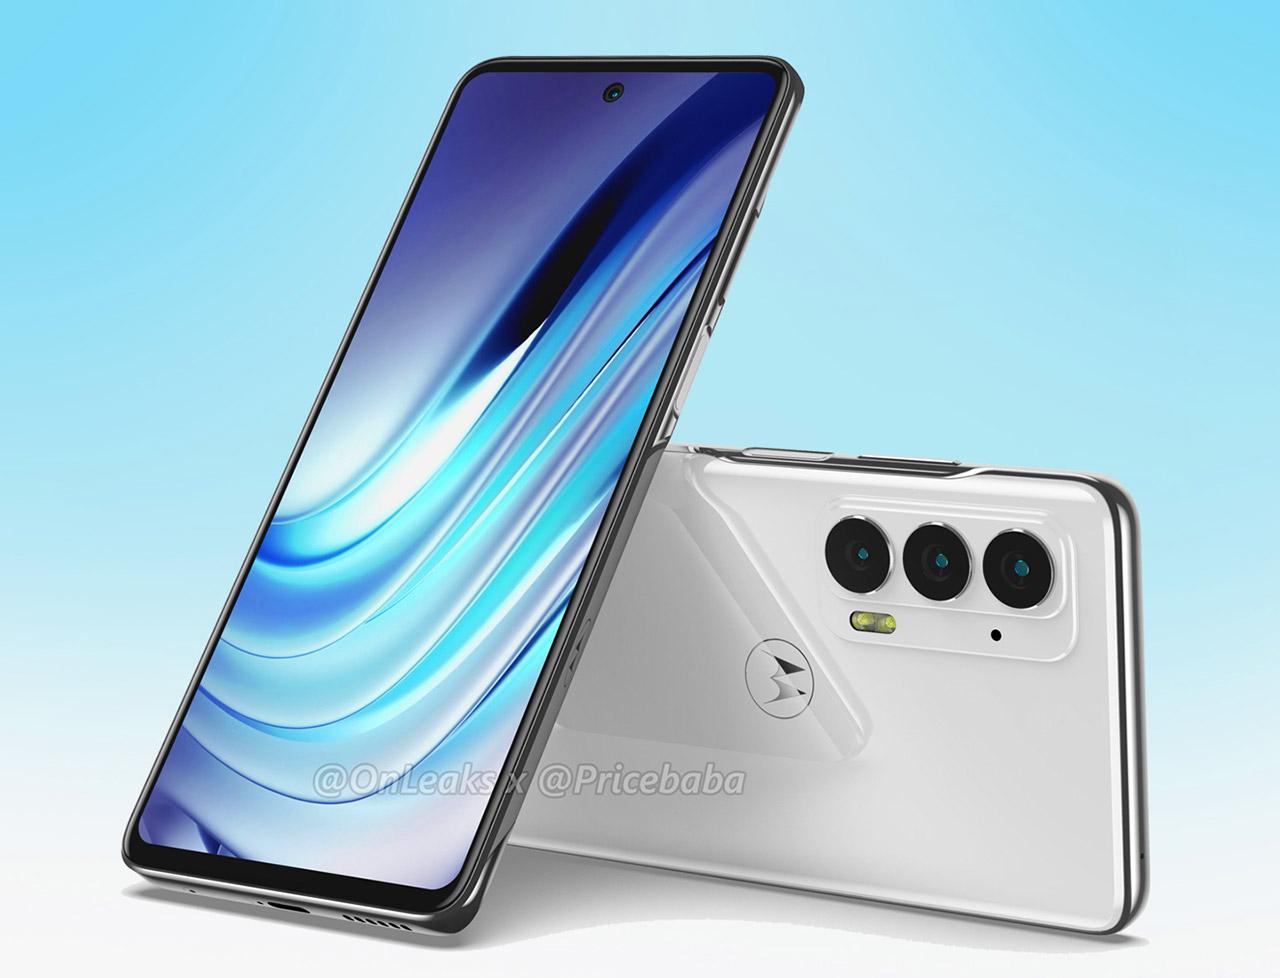 Motorola Edge 20 Mobile Phone Smartphone Leak Release